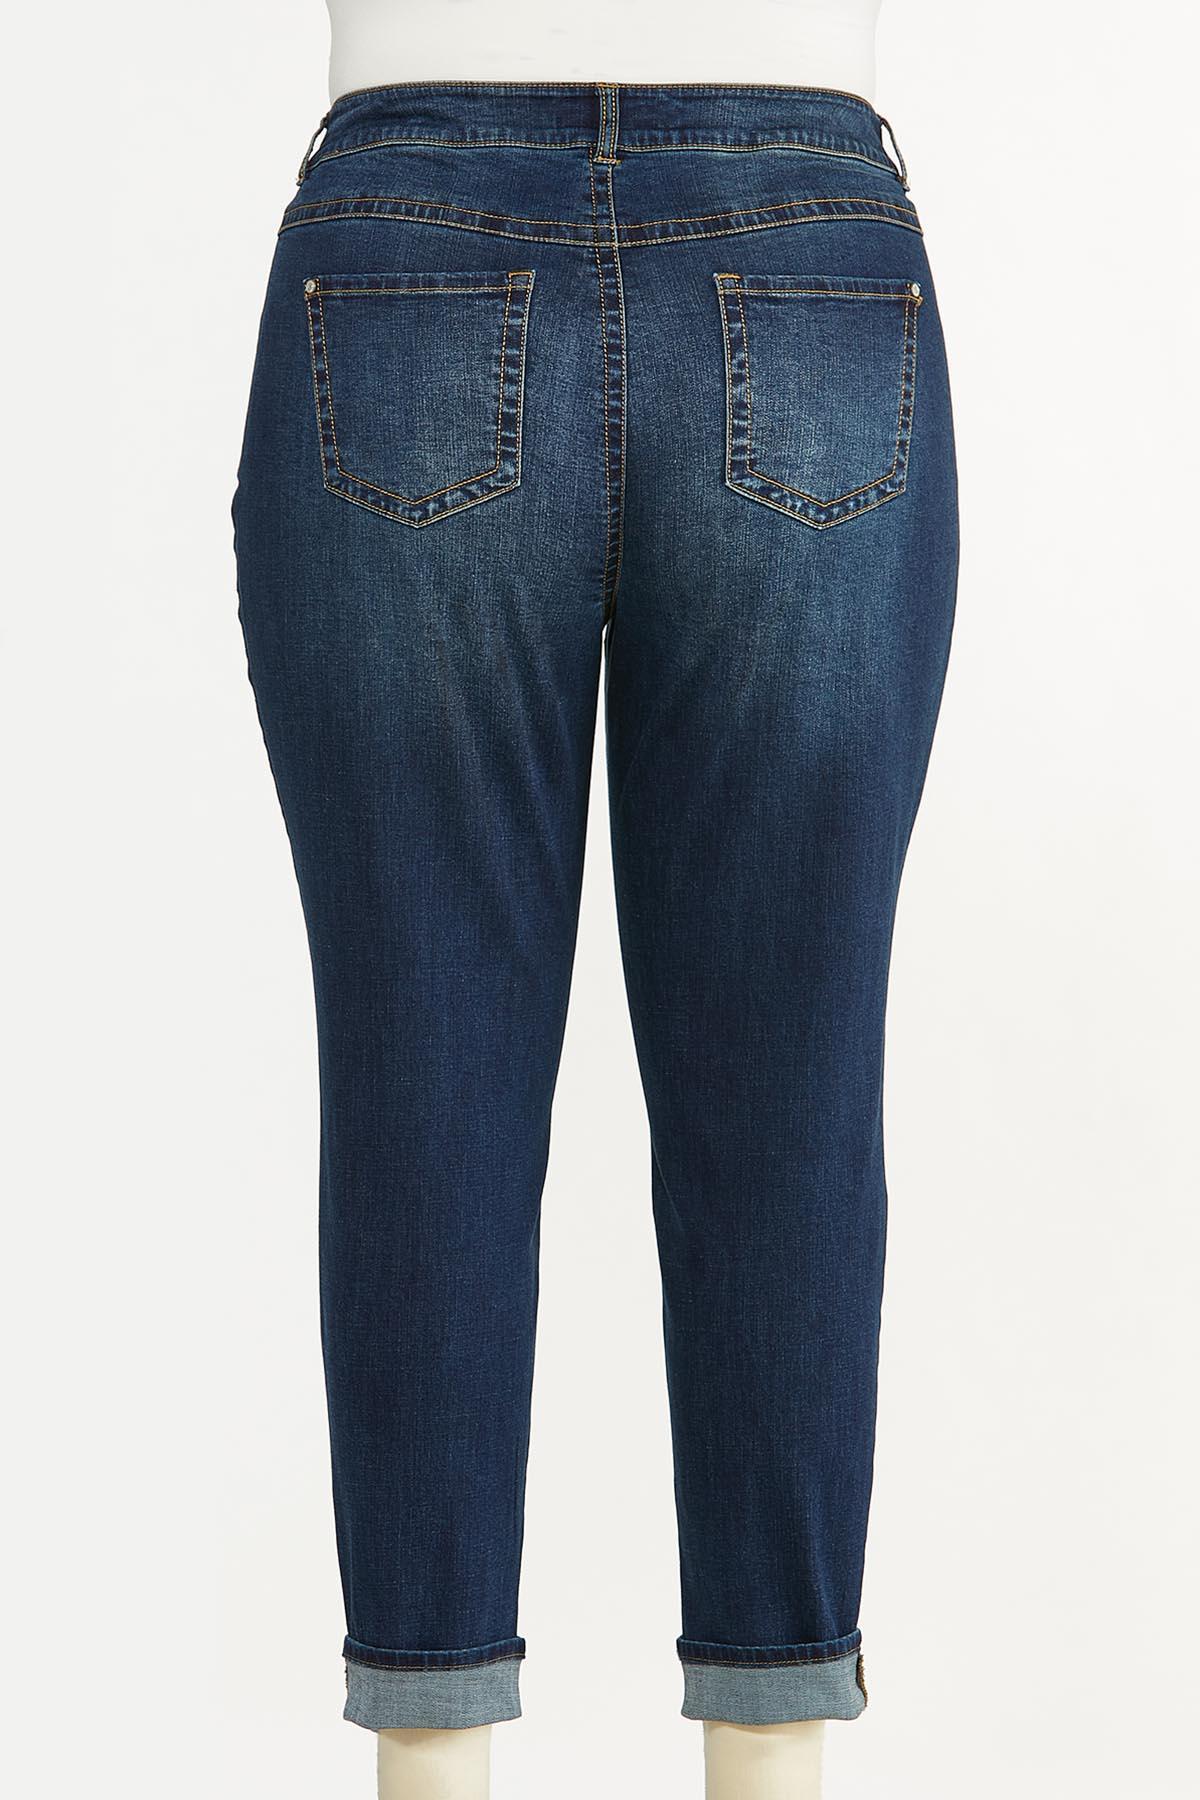 Plus Size Distressed Leopard Patch Jeans (Item #44695496)